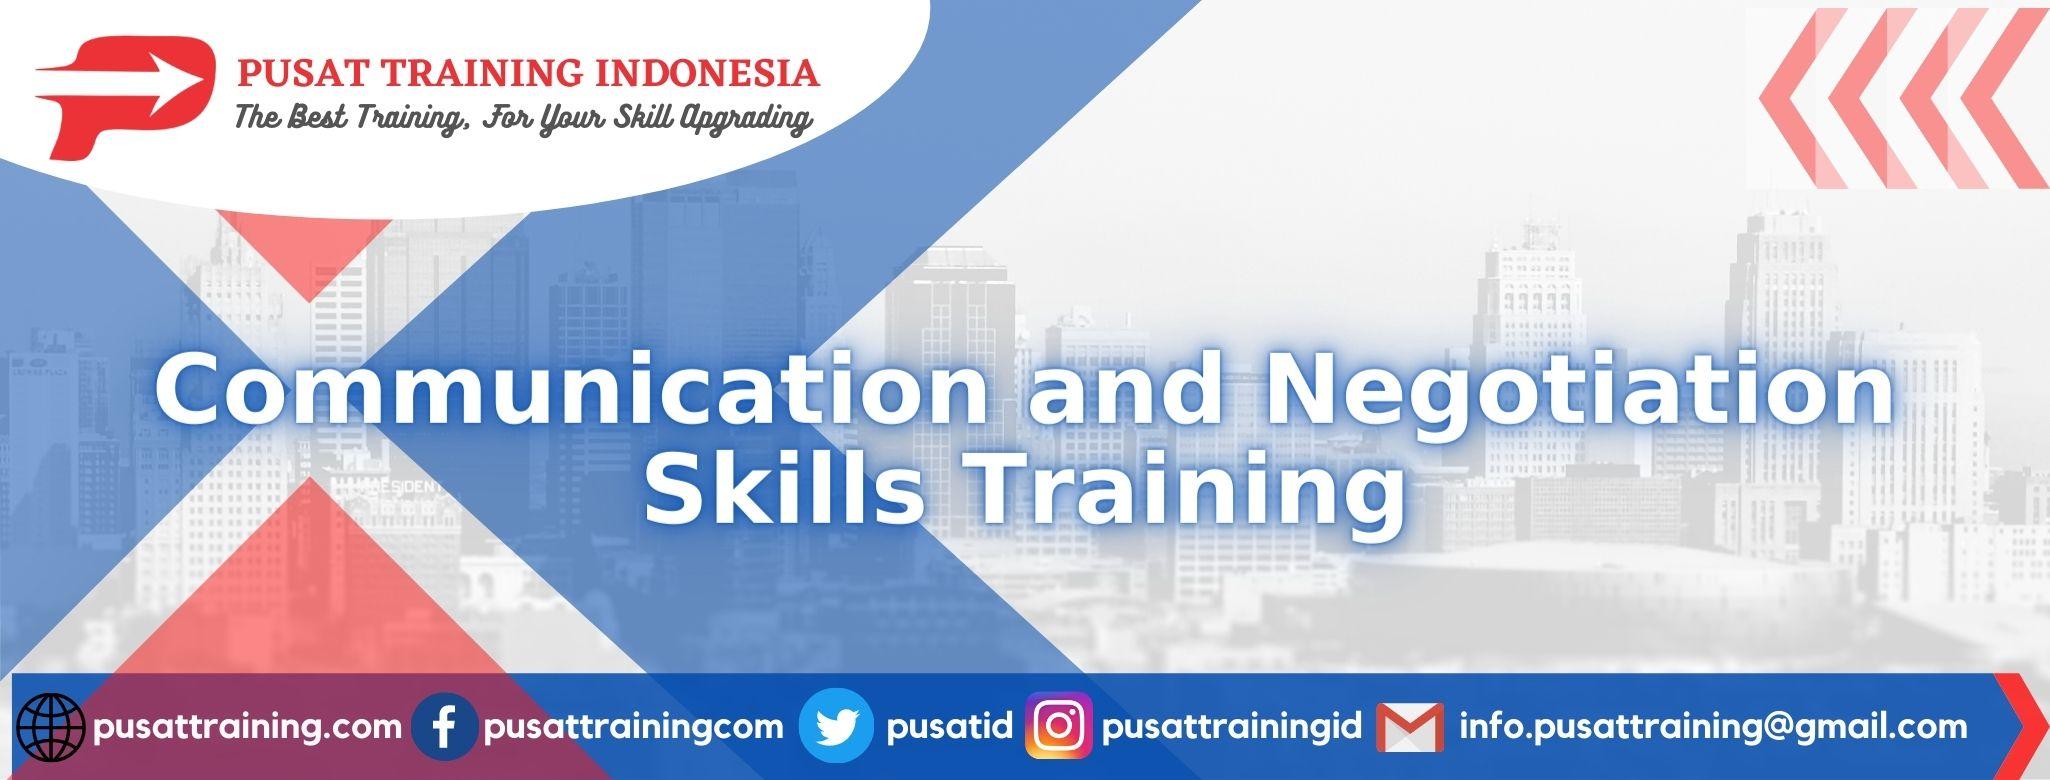 Communication-and-Negotiation-Skills-Training